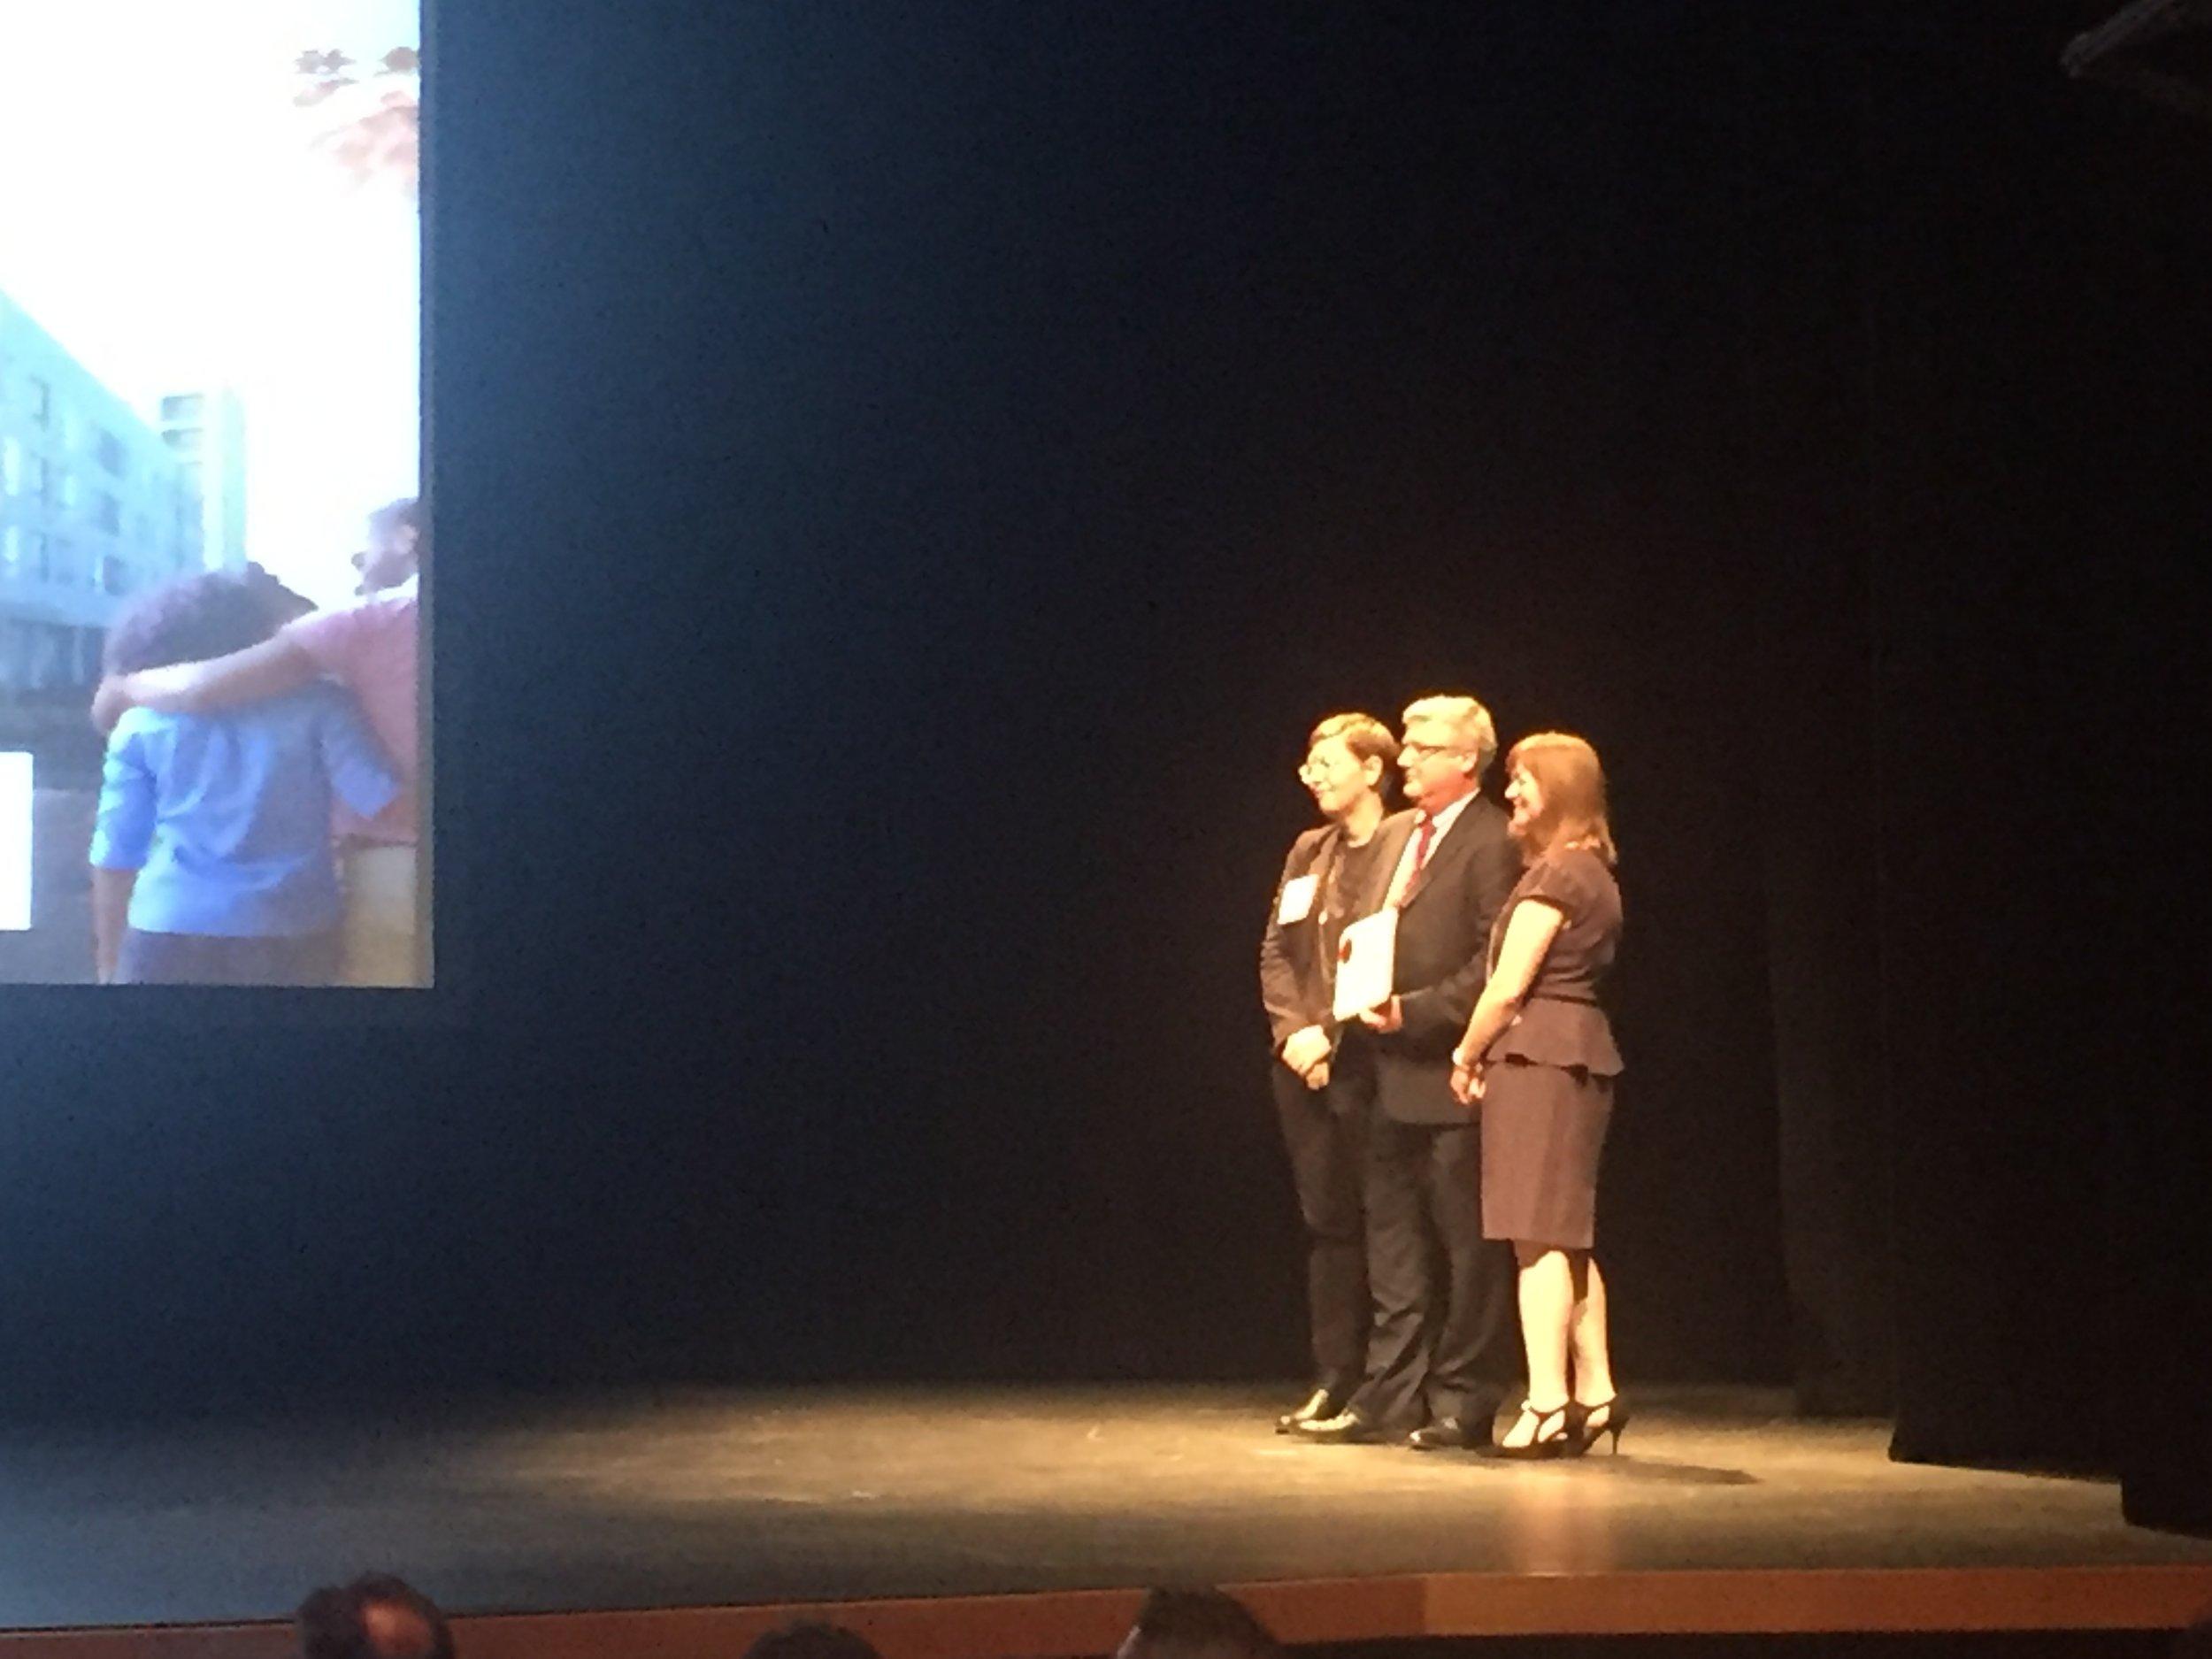 Senior Design Principal Bob Little, AIA, accepting the award on Wednesday evening at The Kimmel Center.